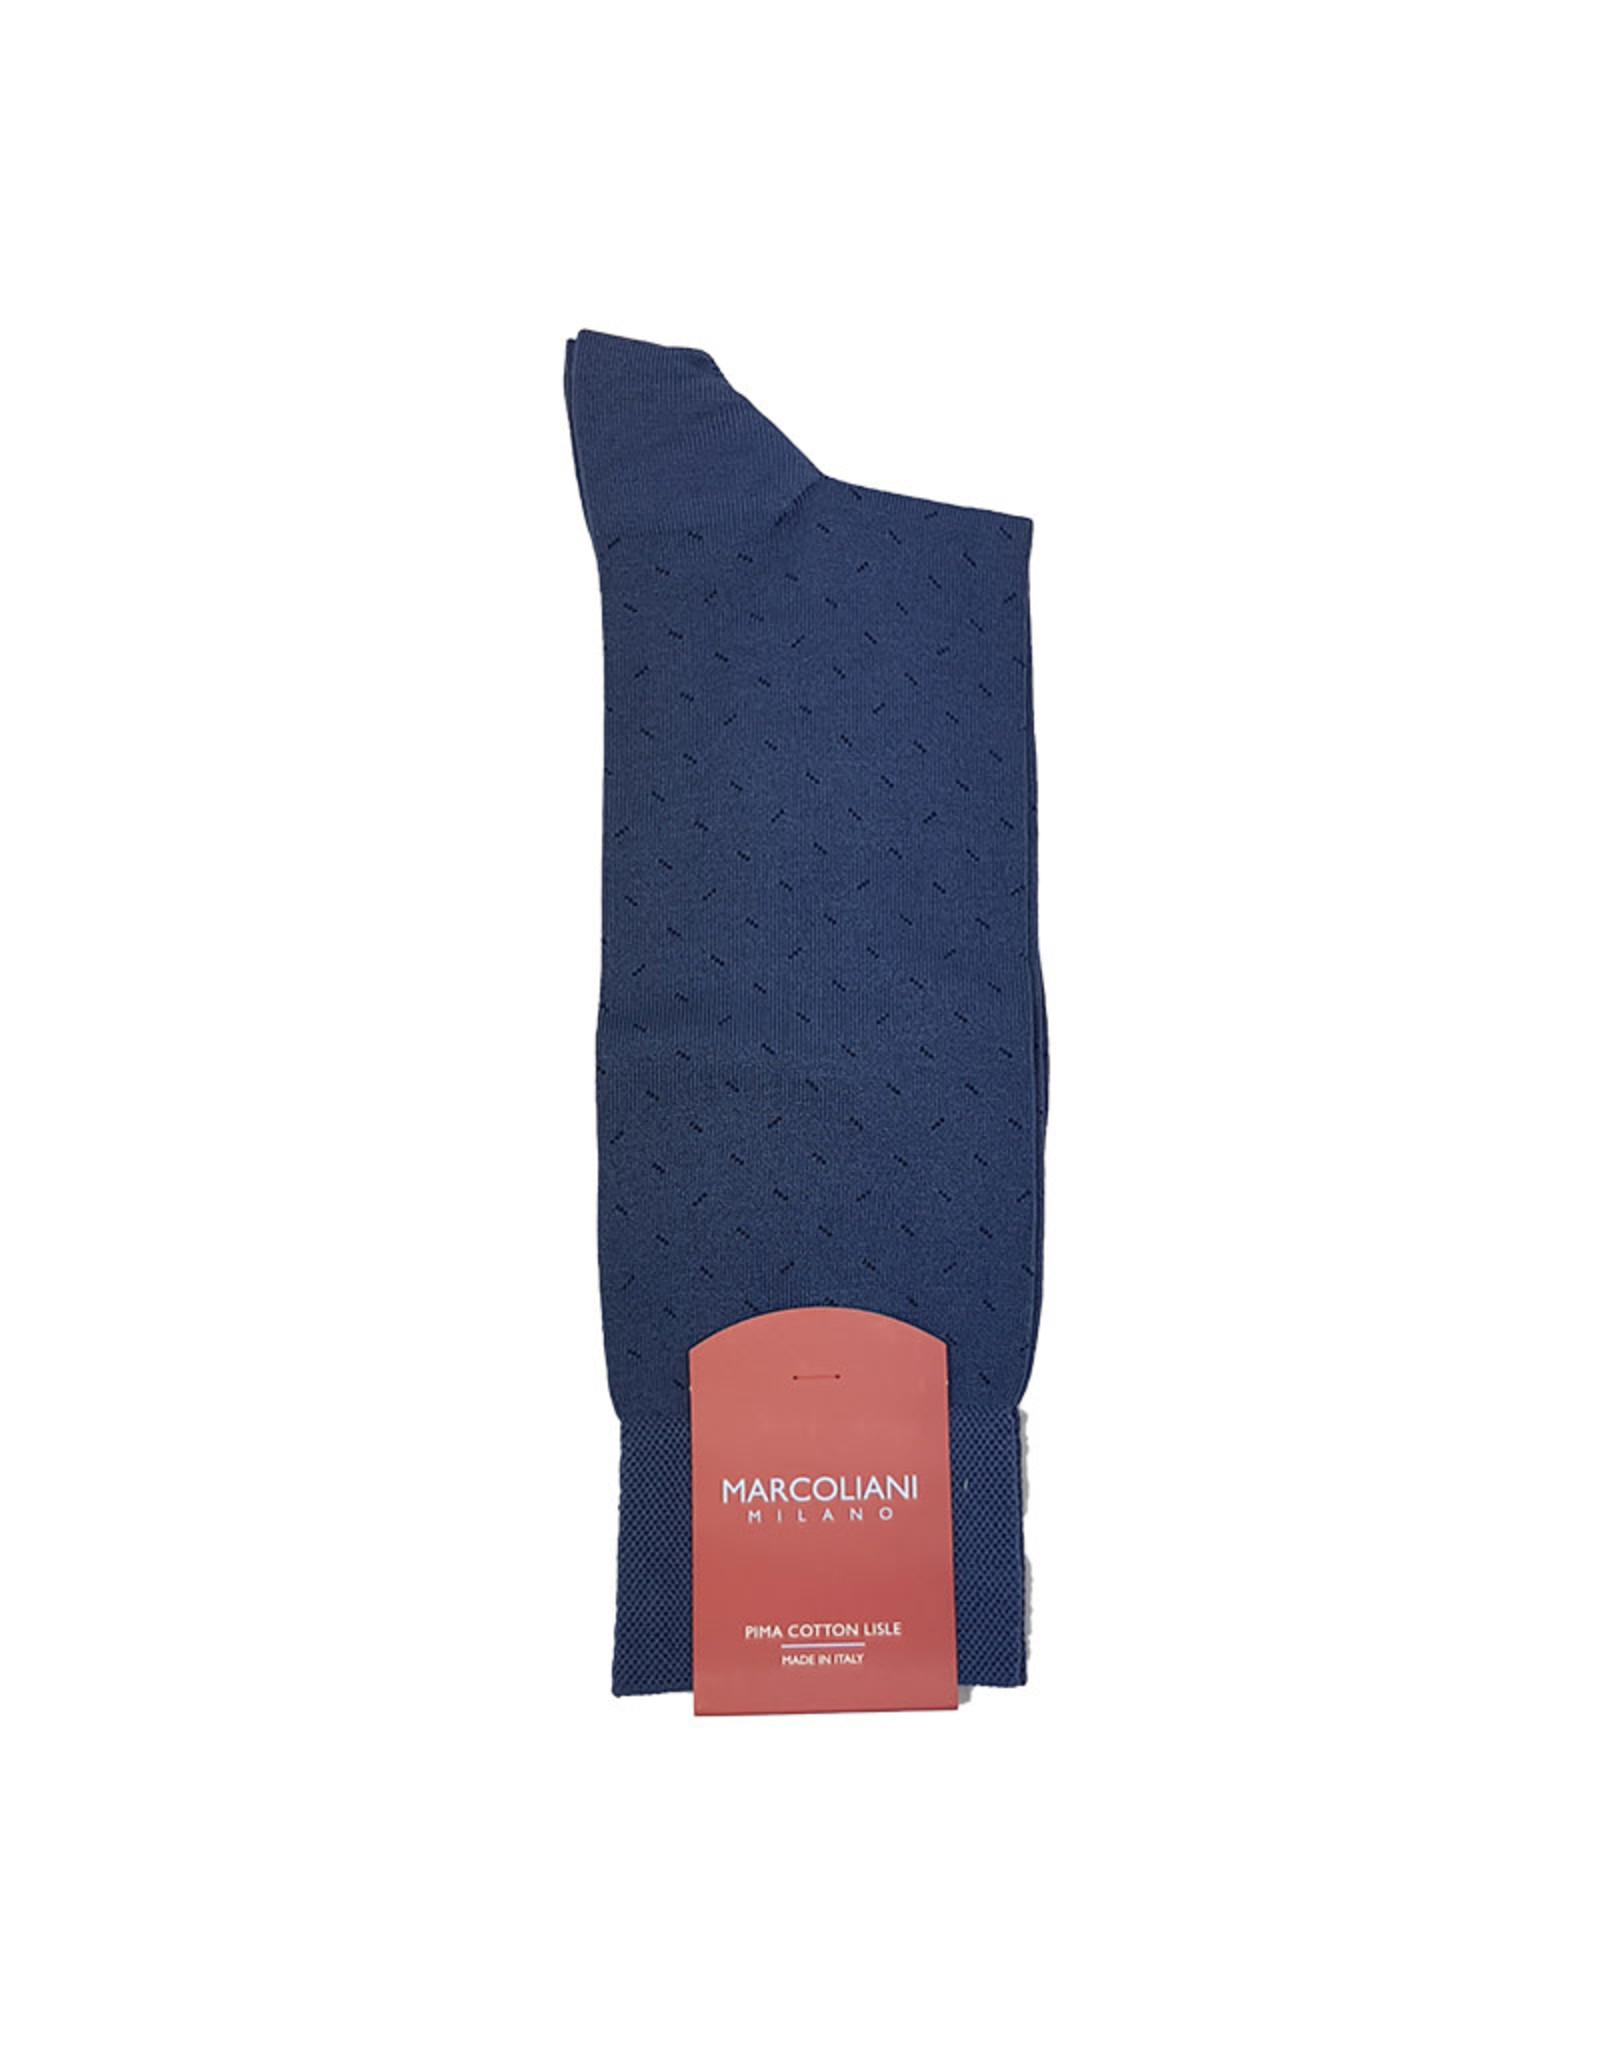 Marcoliani Marcoliani sokken blauw 4202T/012